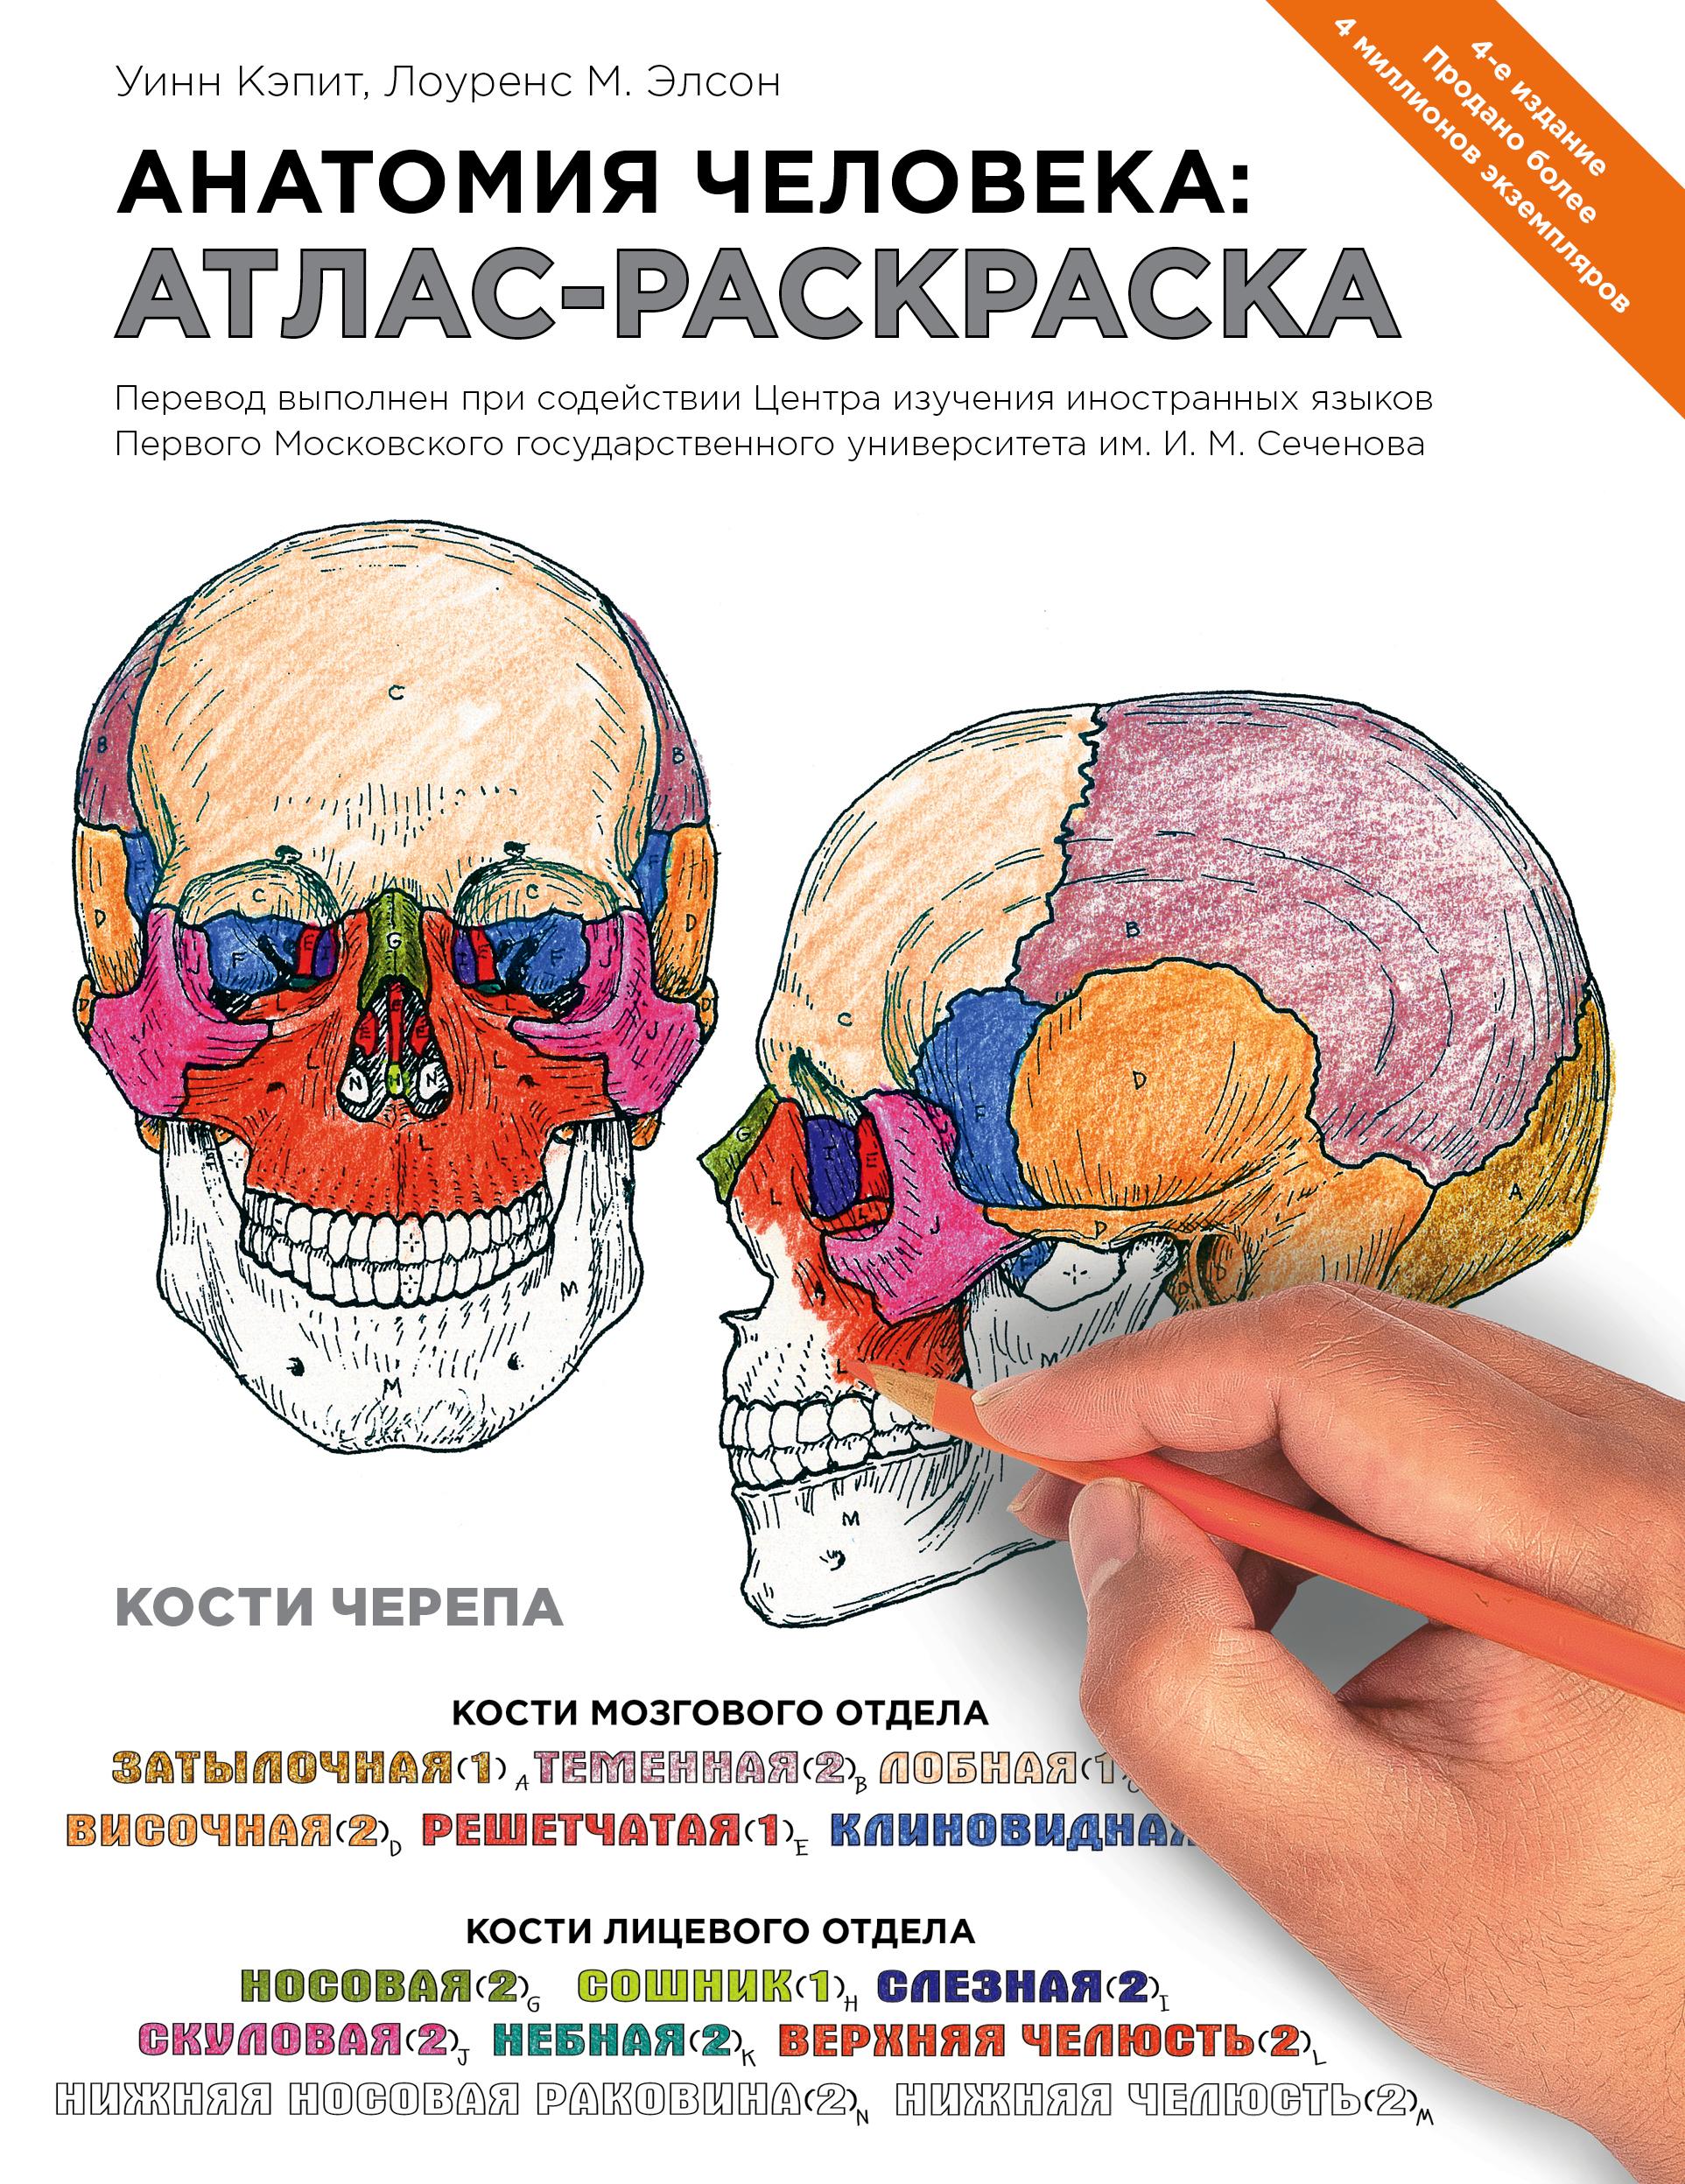 Анатомия человека: атлас-раскраска